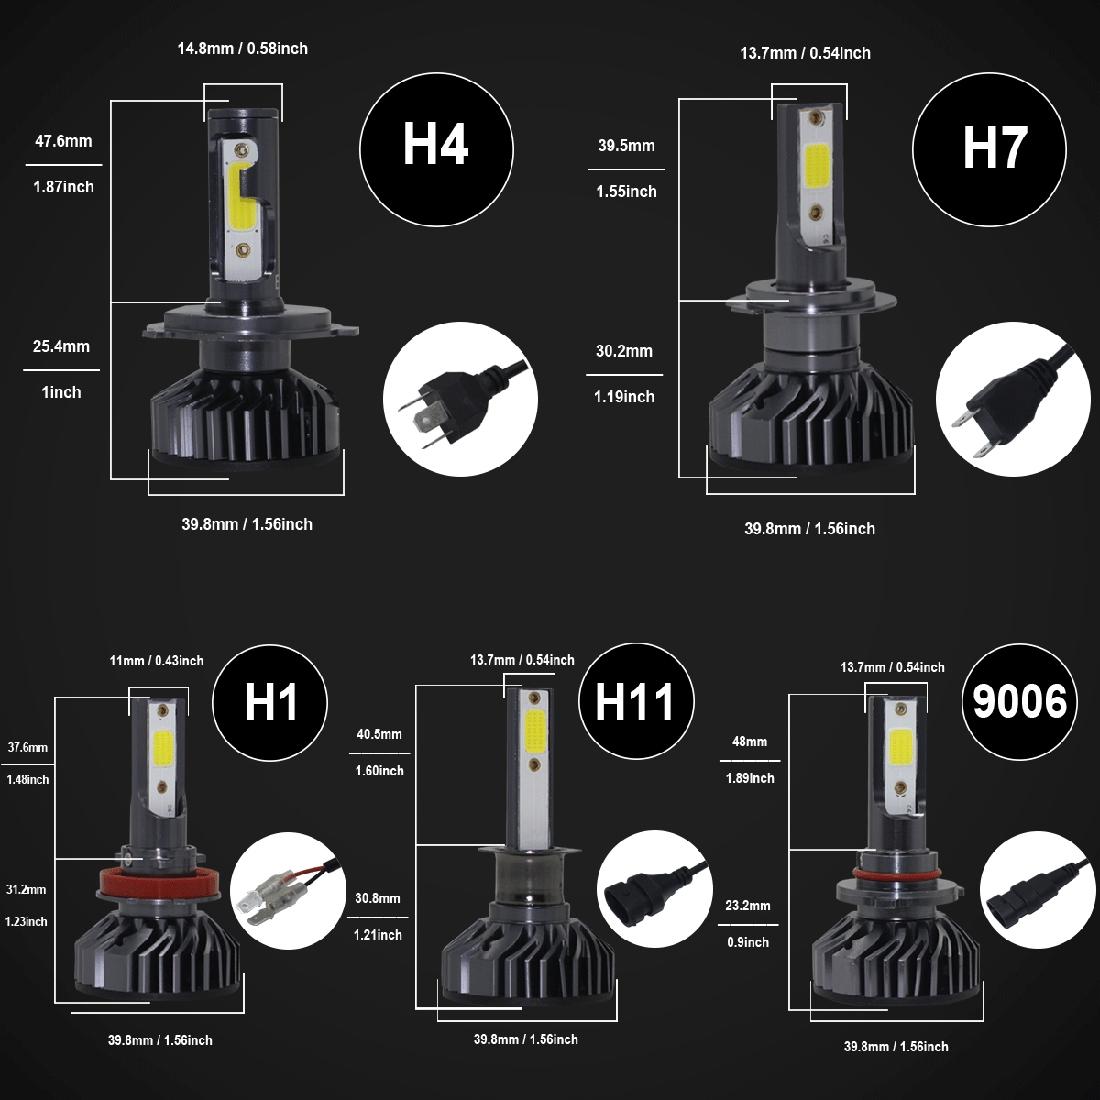 EV8 2 PCS H1 36W 3000LM 6500K DOB LED Headlight Bulbs High Beam Conversion Kit DC 9-32V (Xenon White)